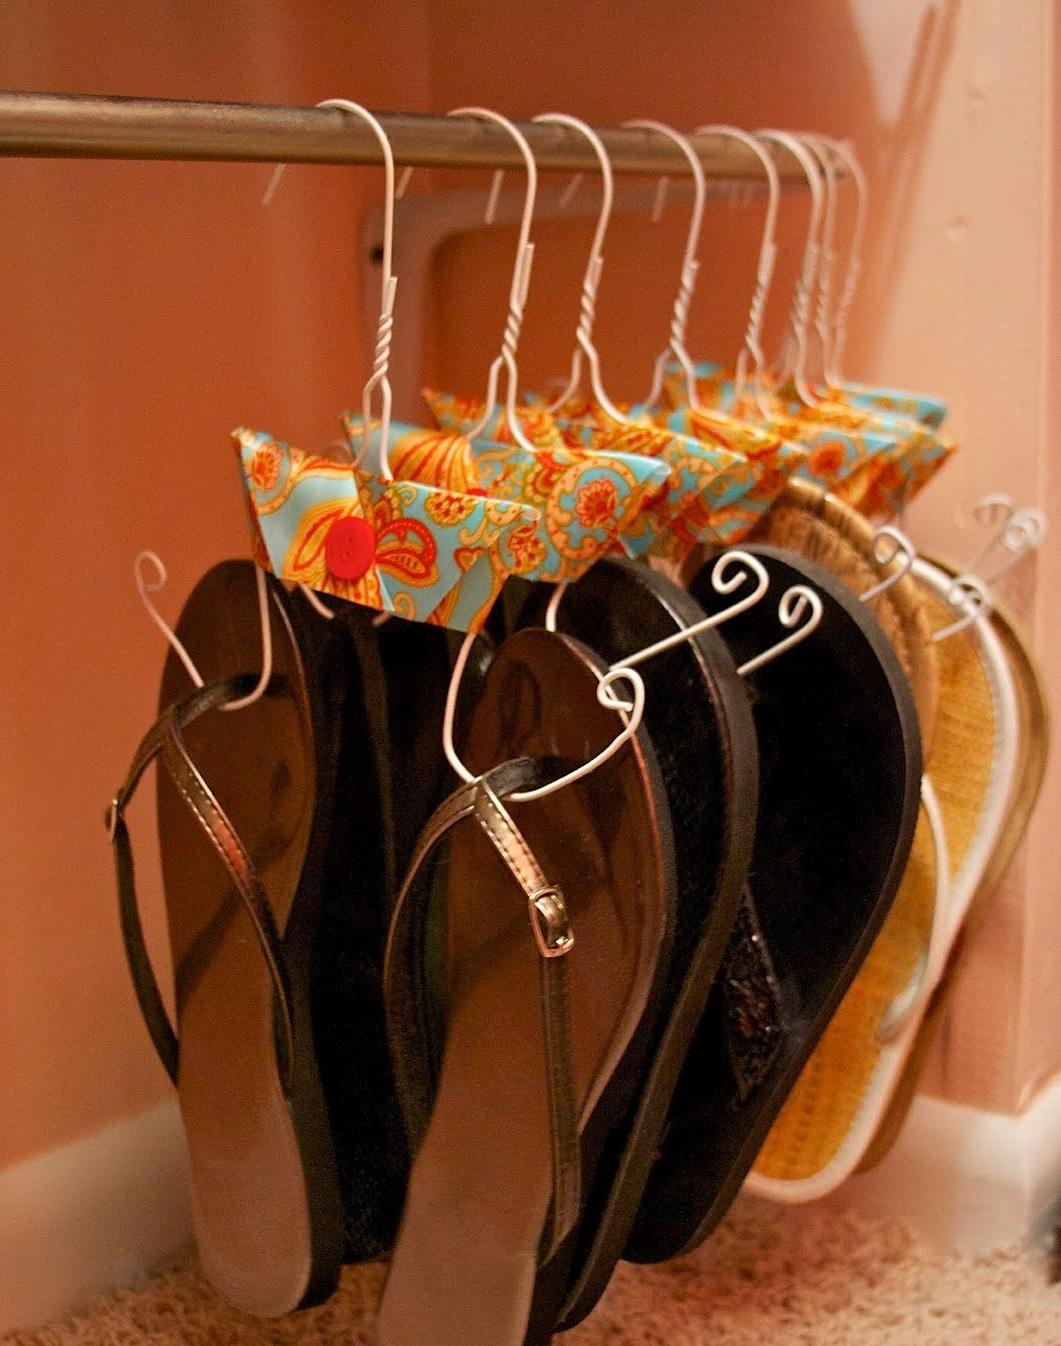 cabides-para-calcados-chinelos